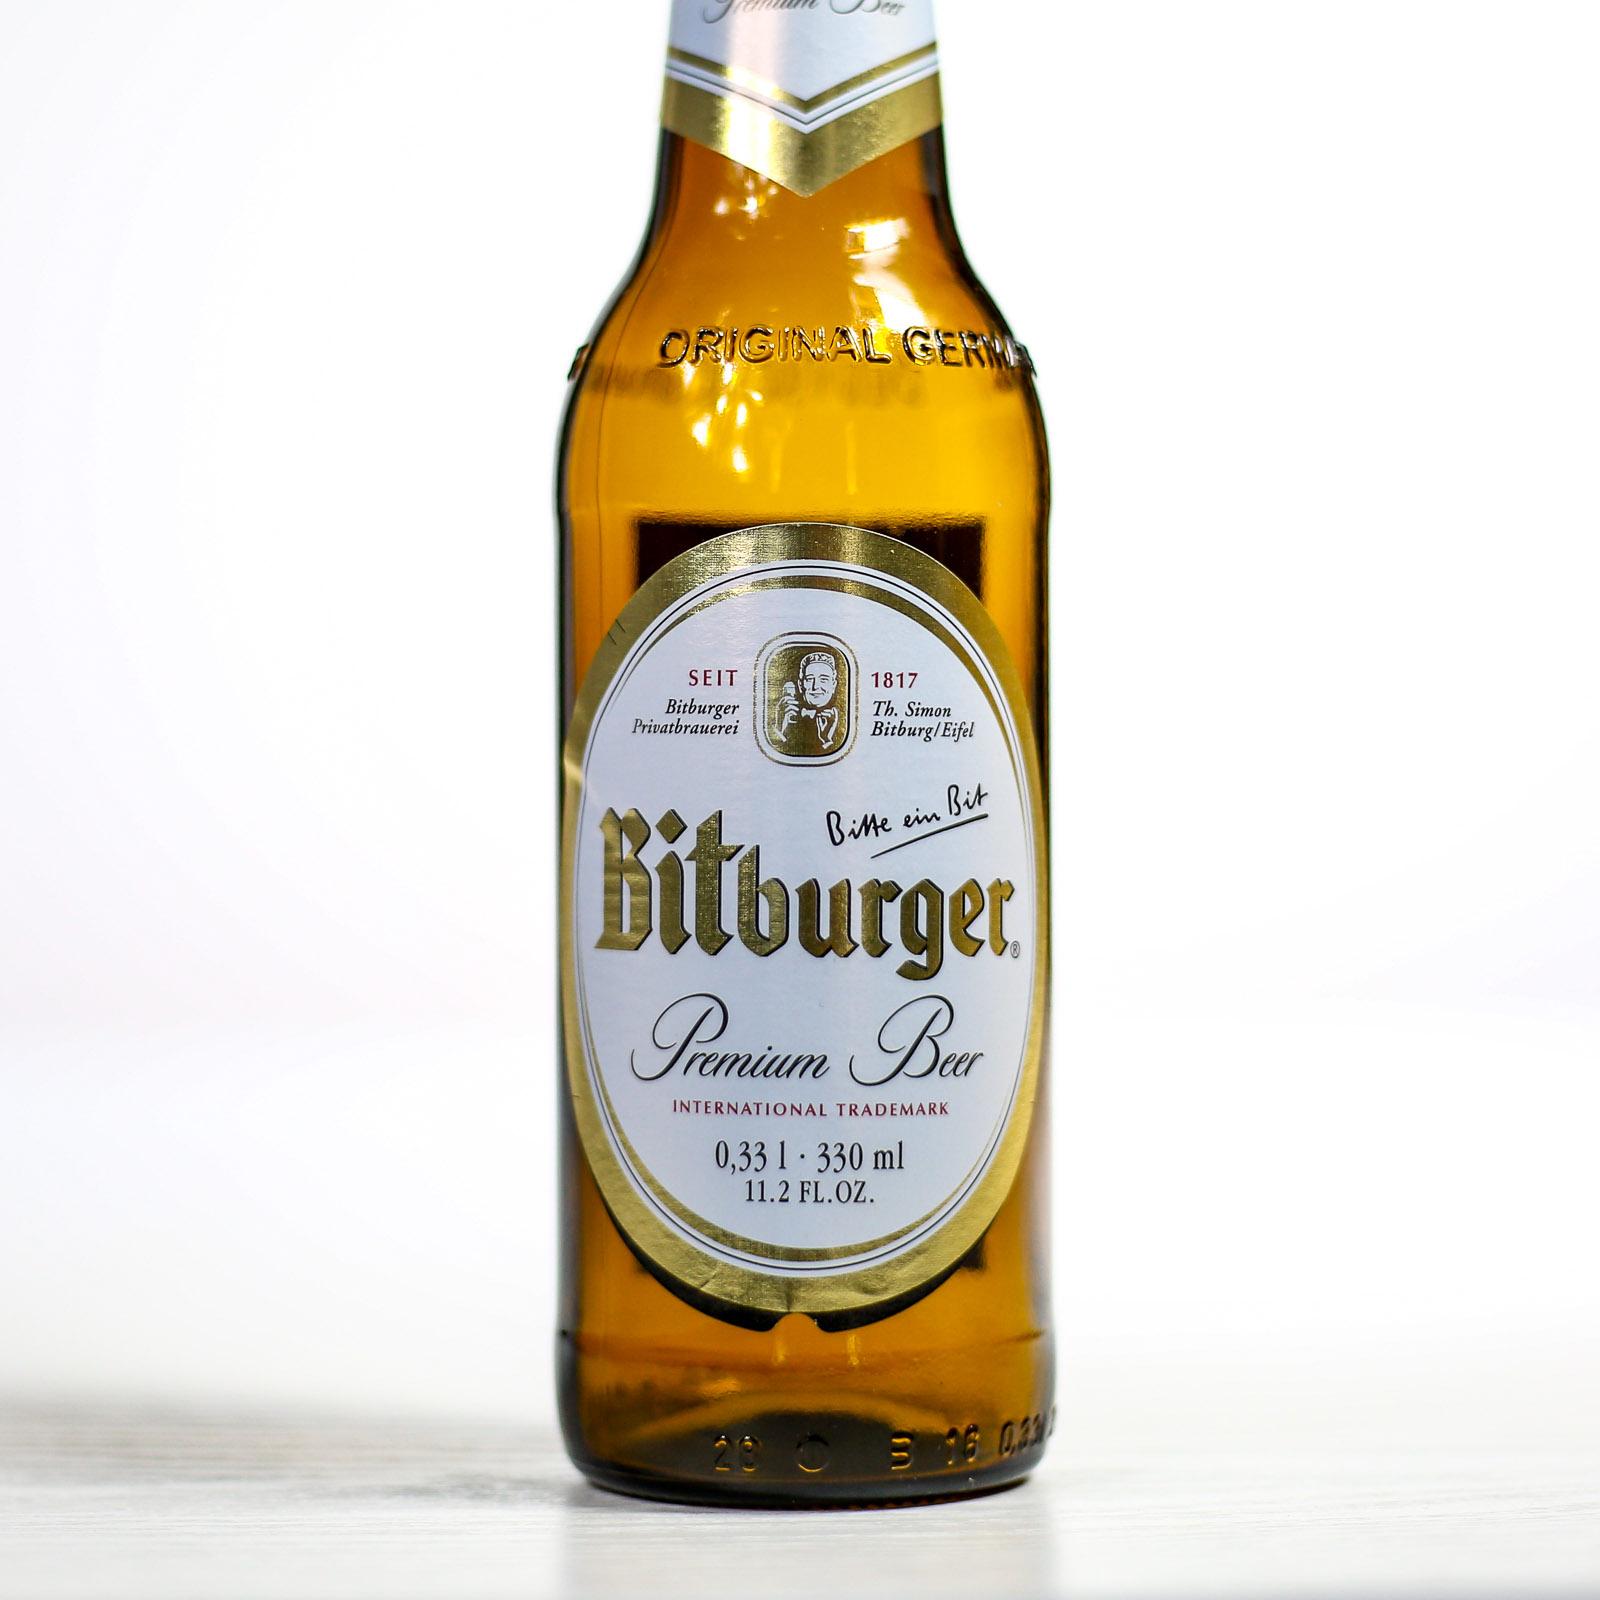 Bitburger German Beer 4x330ml £3.49 at Home Bargains